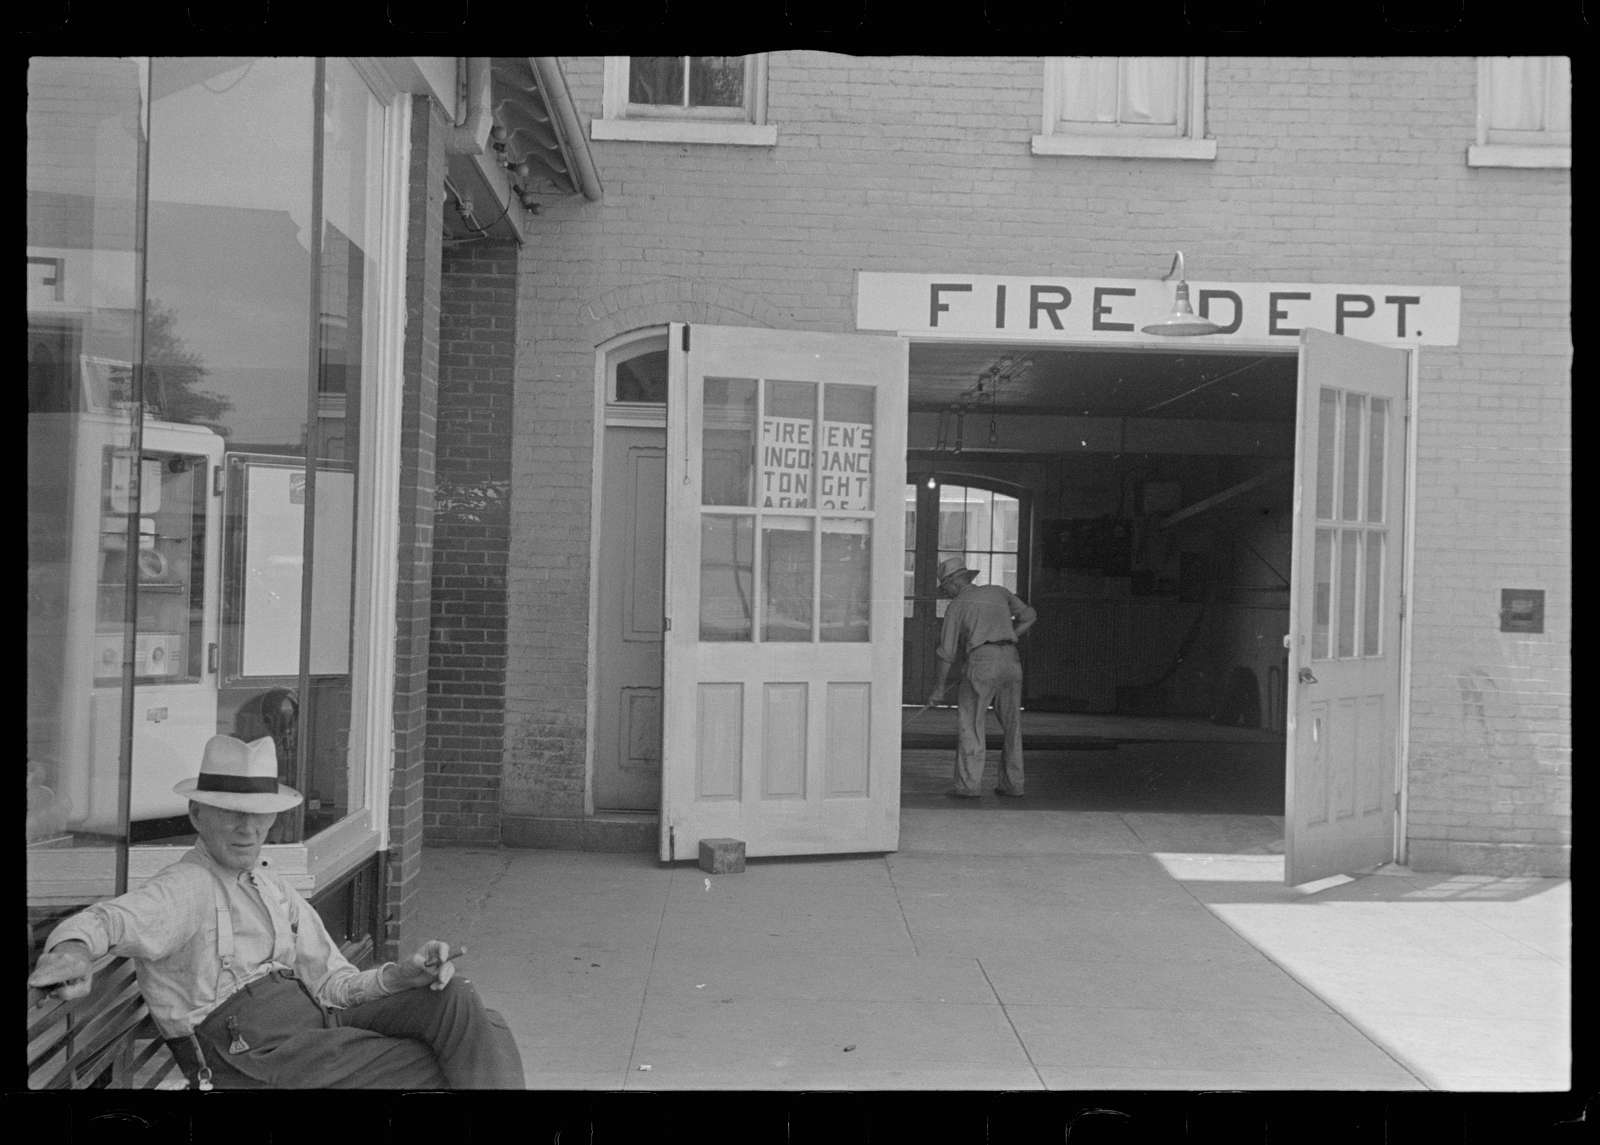 Fire department, Somerset, Ohio